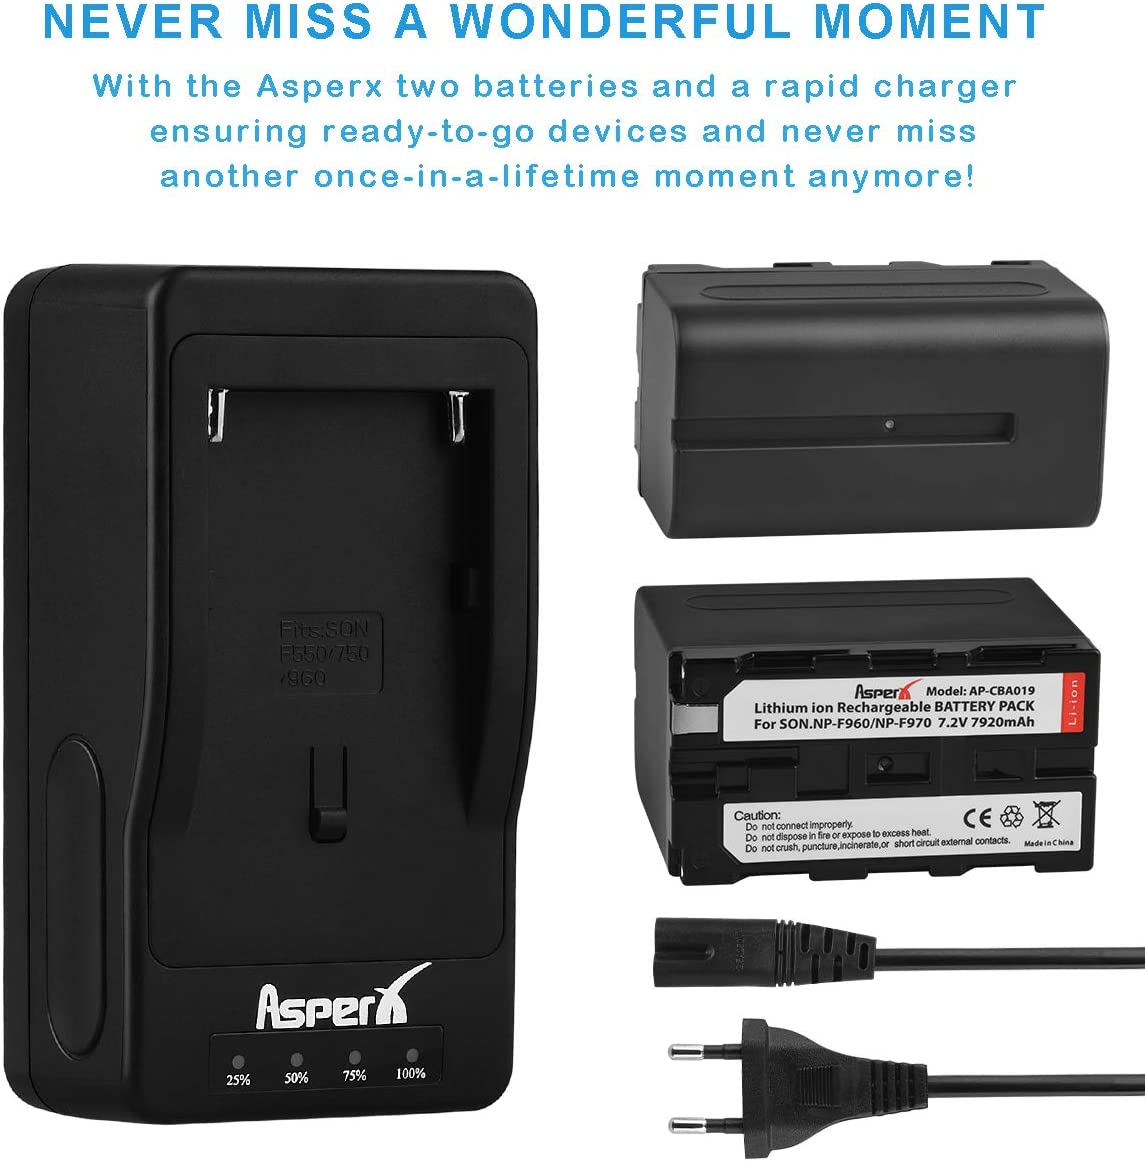 2 Pack Replacement Battery and Fast Charger for Sony DCR-VX2100 HDR-AX2000 FX1 FX7 FX1000 HVR-HD1000U V1U Z1P Z1U Z7U HXR-MC2000U FS100U FS700U and LED Video Light Asperx NP-F960//NP-F970